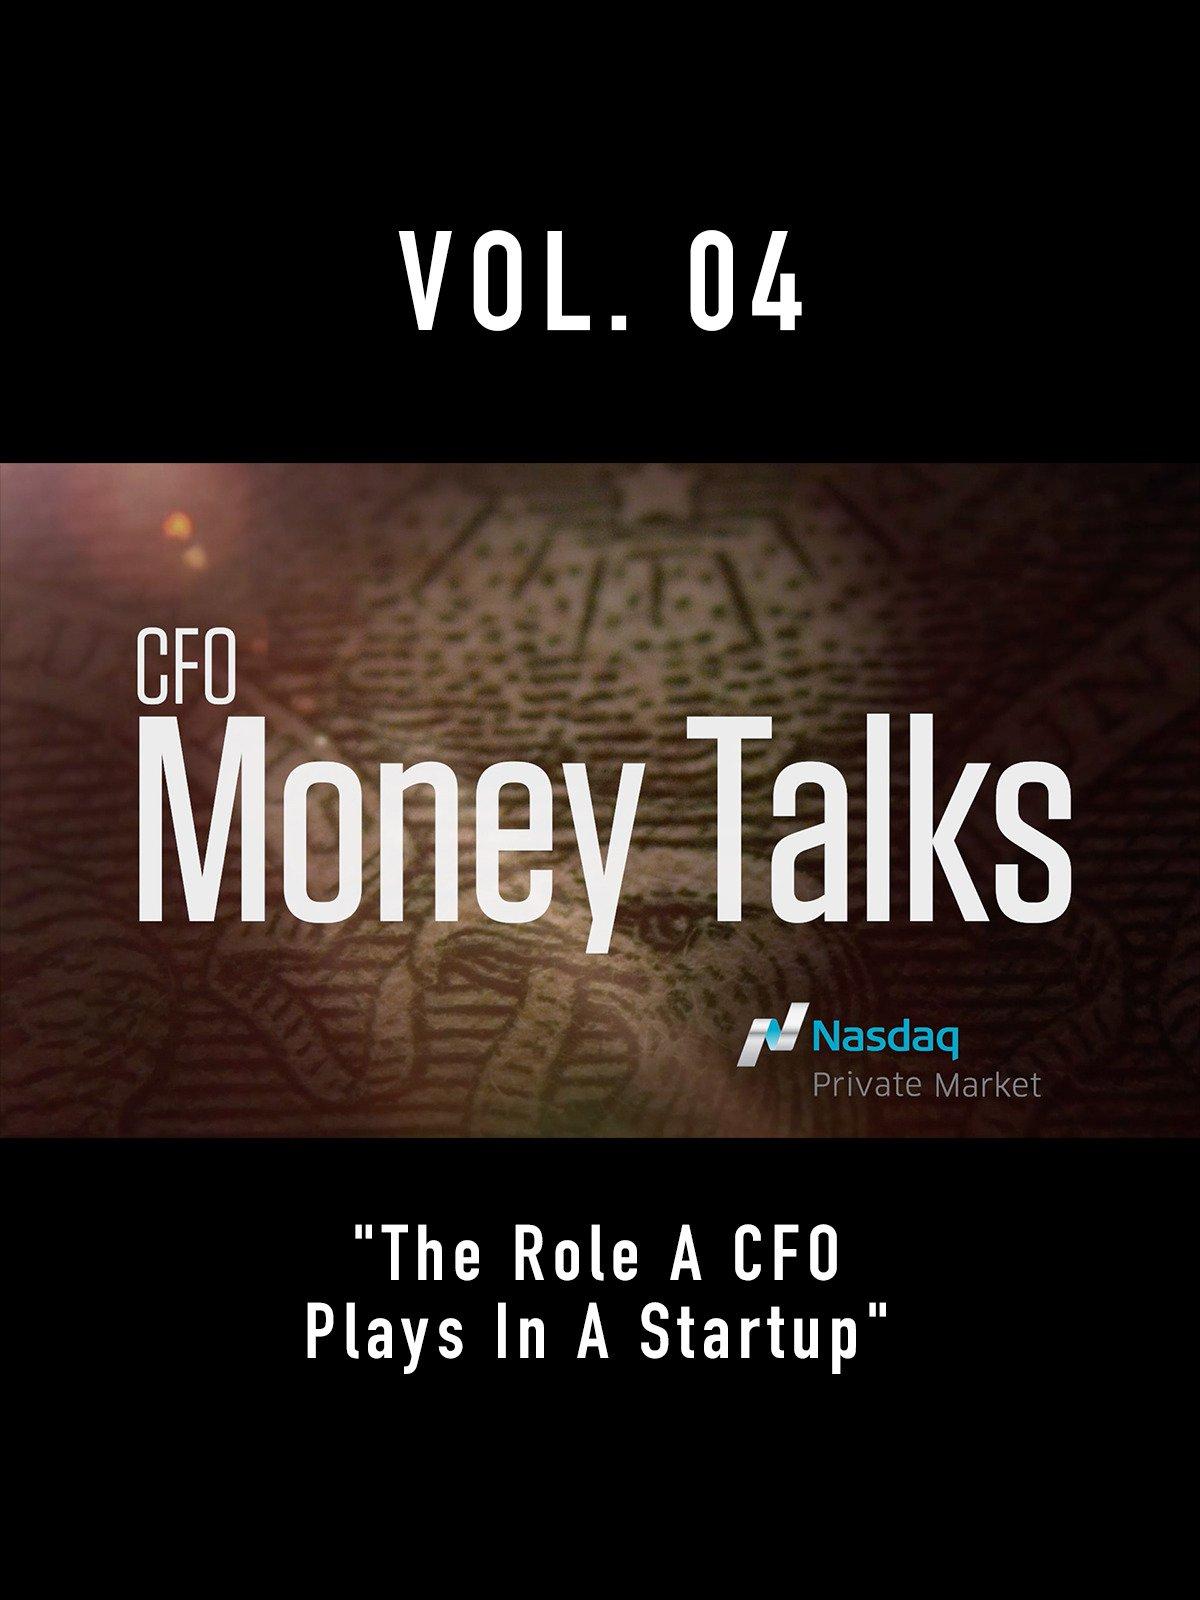 CFO Money Talks Vol. 04